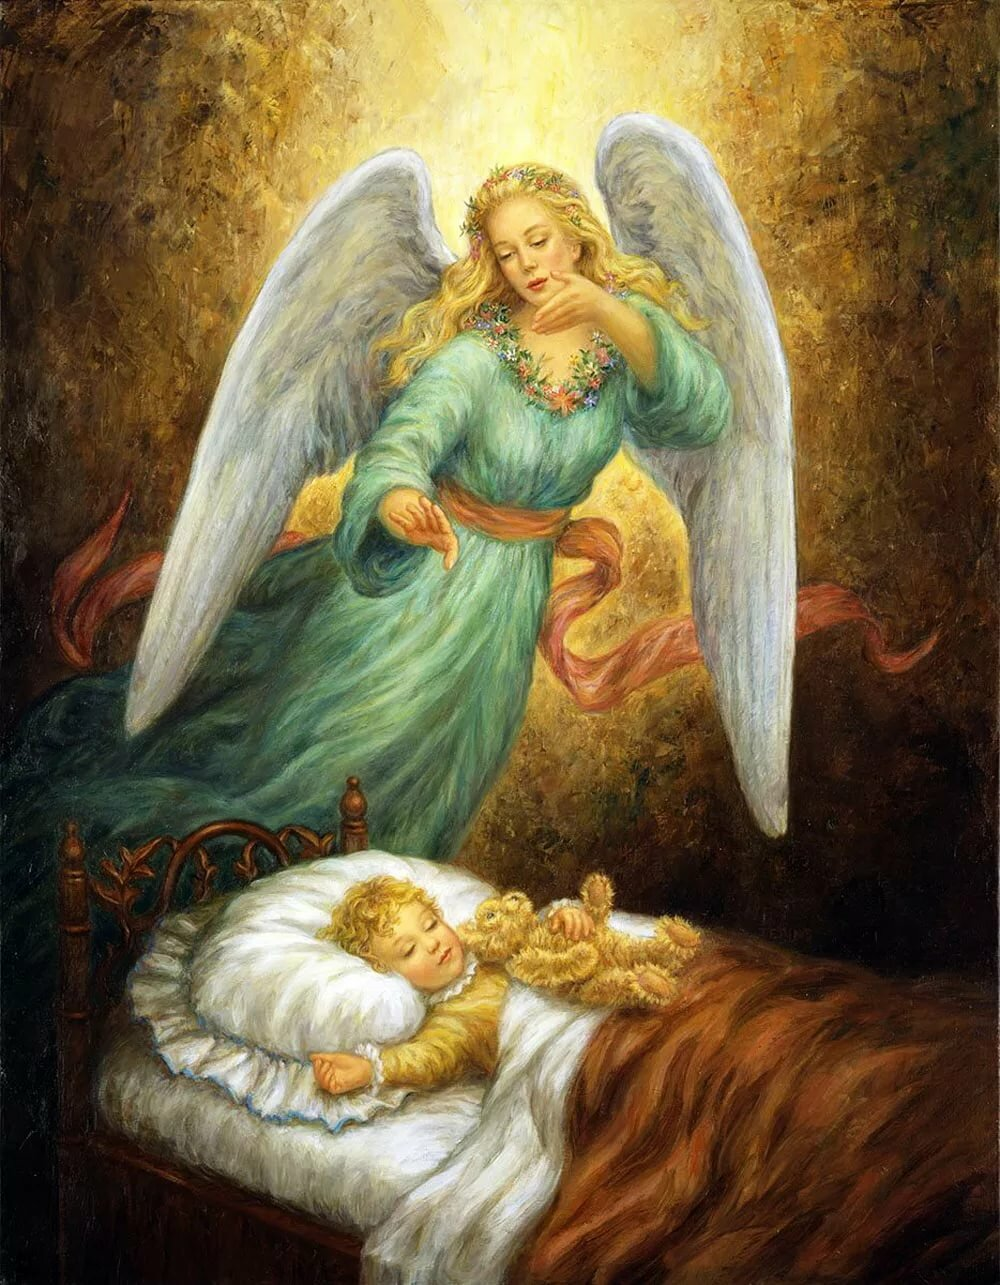 шапик картинки ангела хронителя было, когда шоу